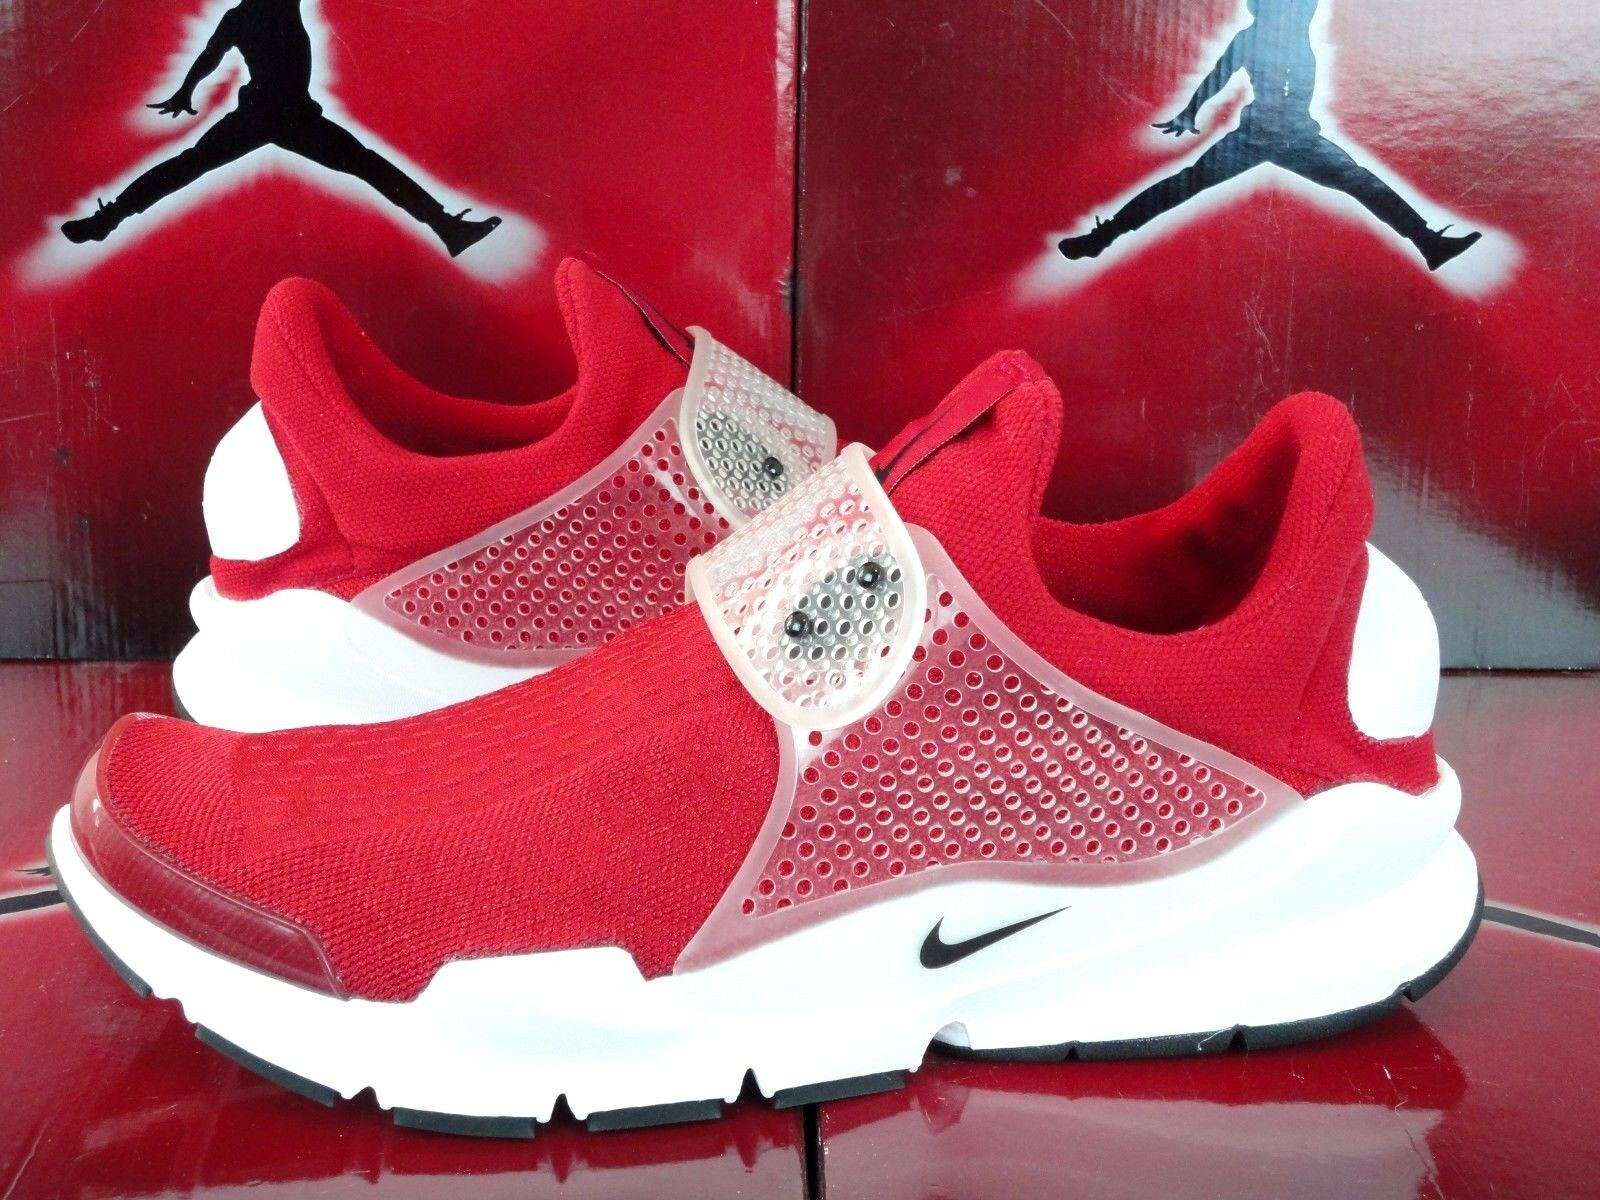 Nike sock rosso dardo sz 12 palestra rosso sock - nero bianco 819686 601 nuova aria scarpe da corsa 50d9d7